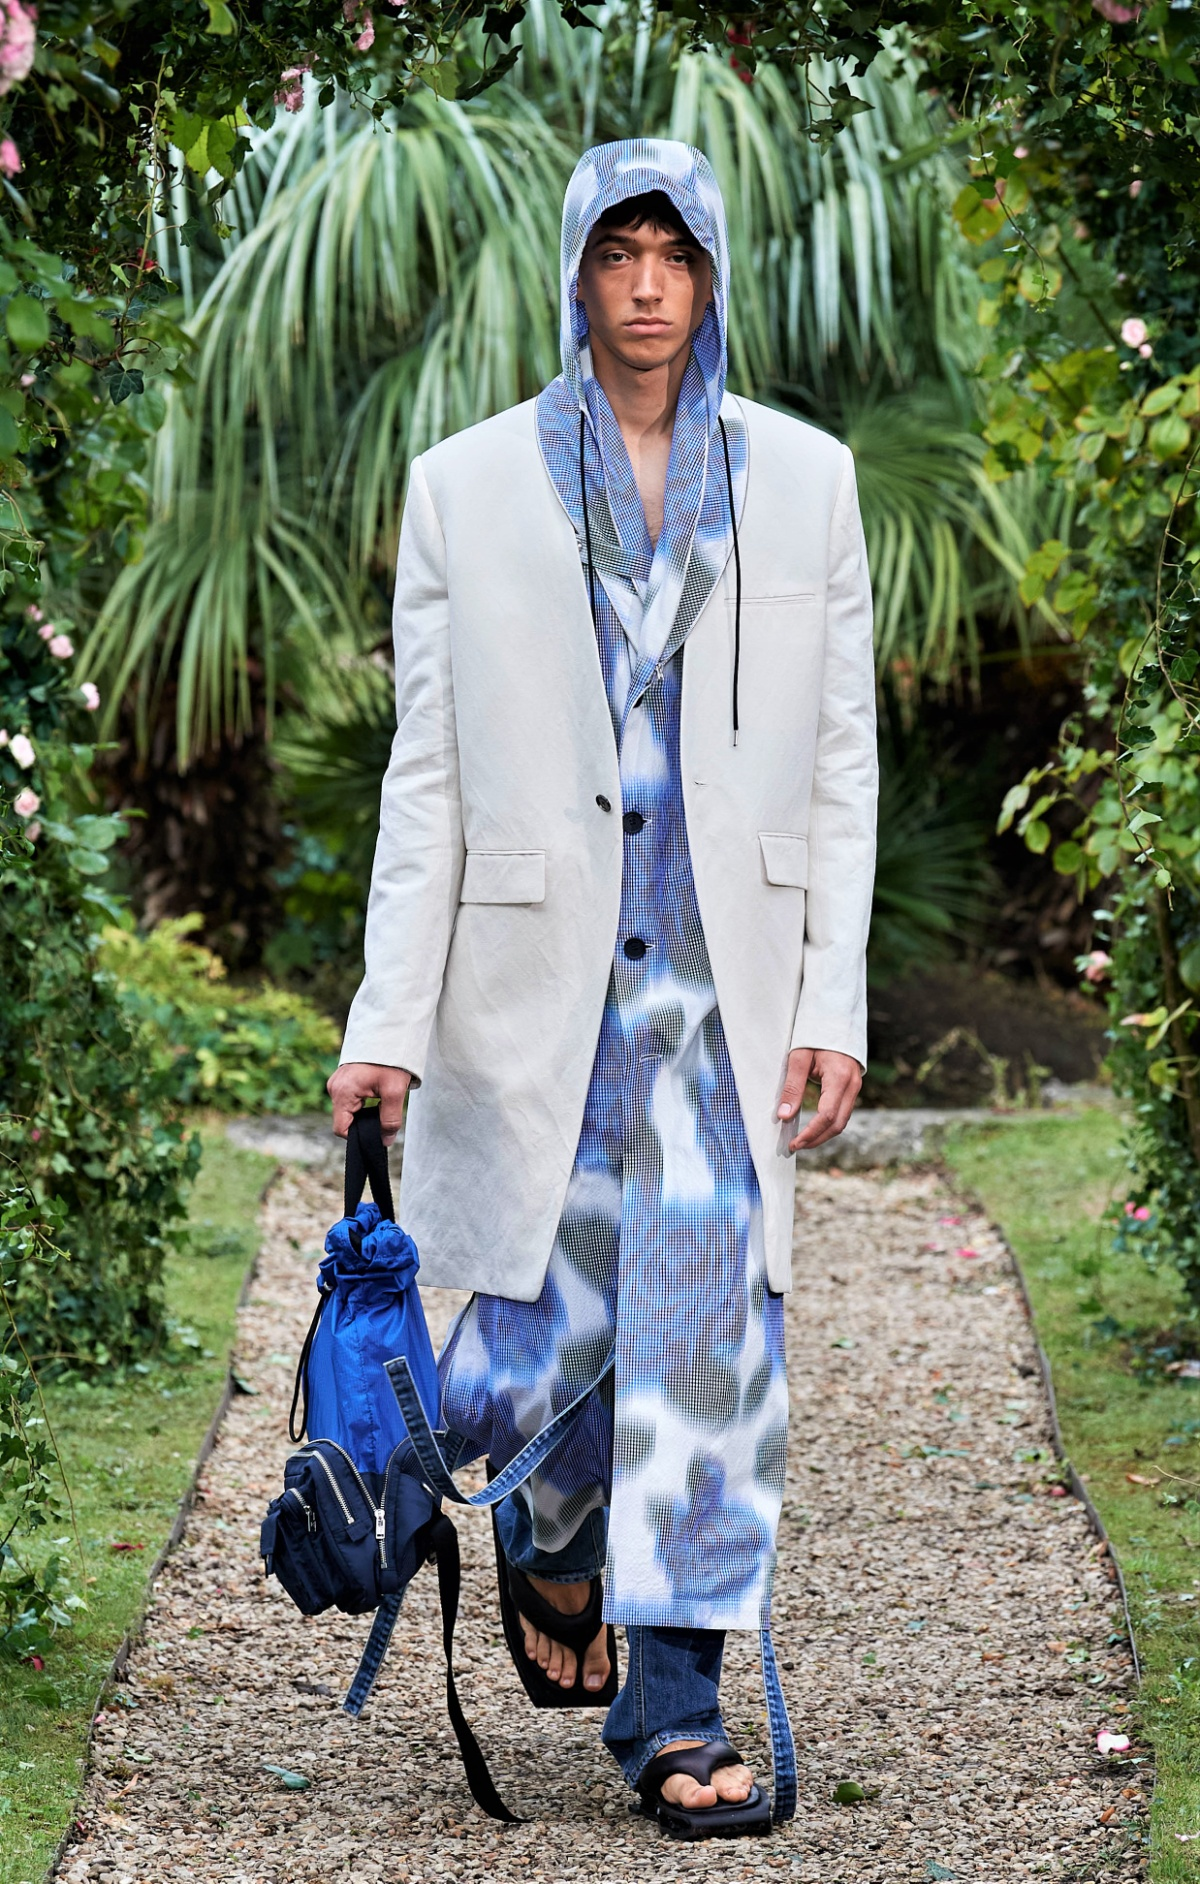 Kenzo SS21 029 mens batik blue hoody Paris cropped.jpg